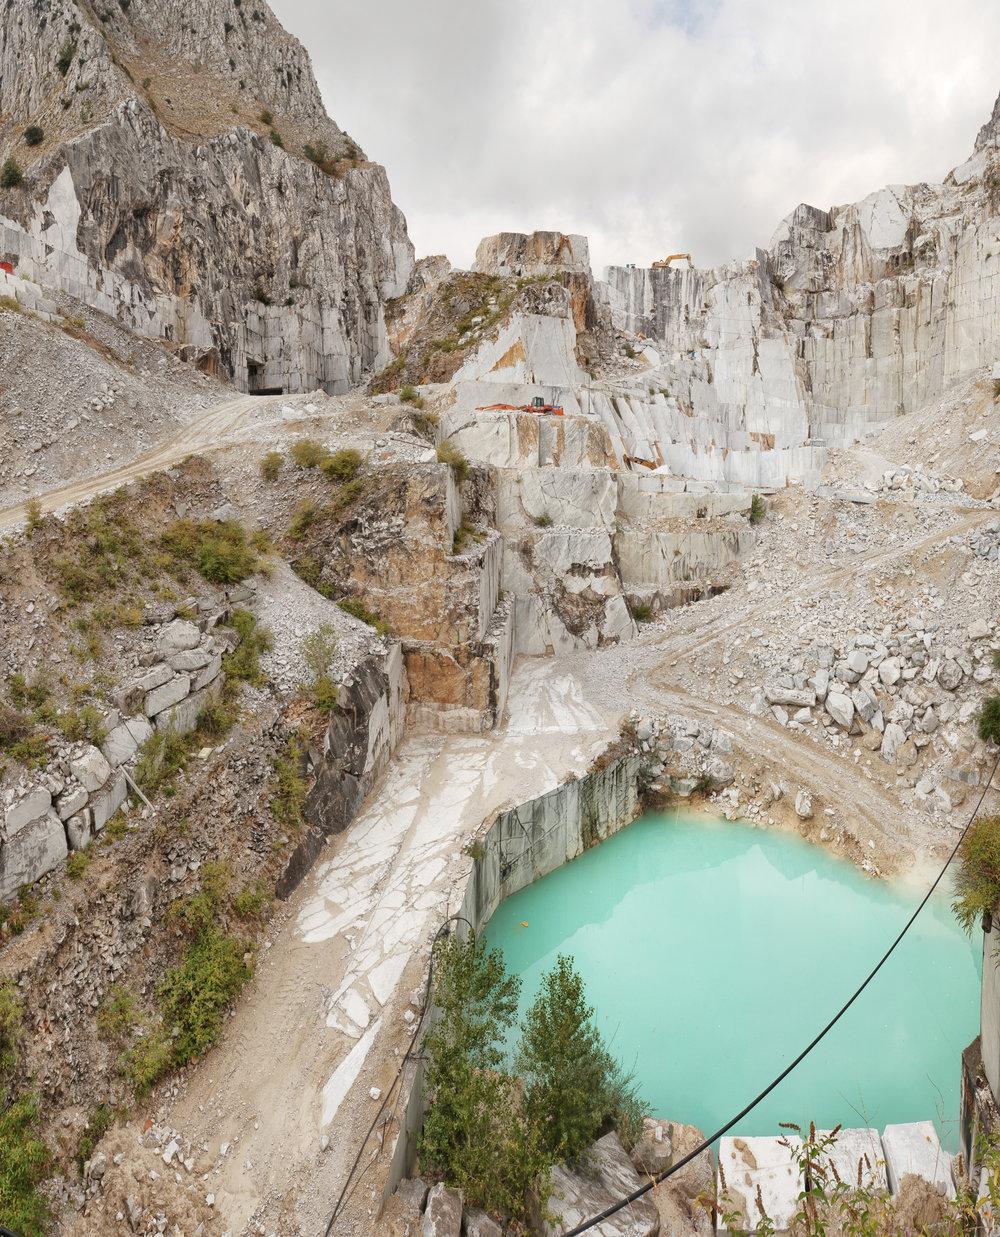 Lake II - Carrara, Italy 2015 -  Ref:  CITCA_AA1